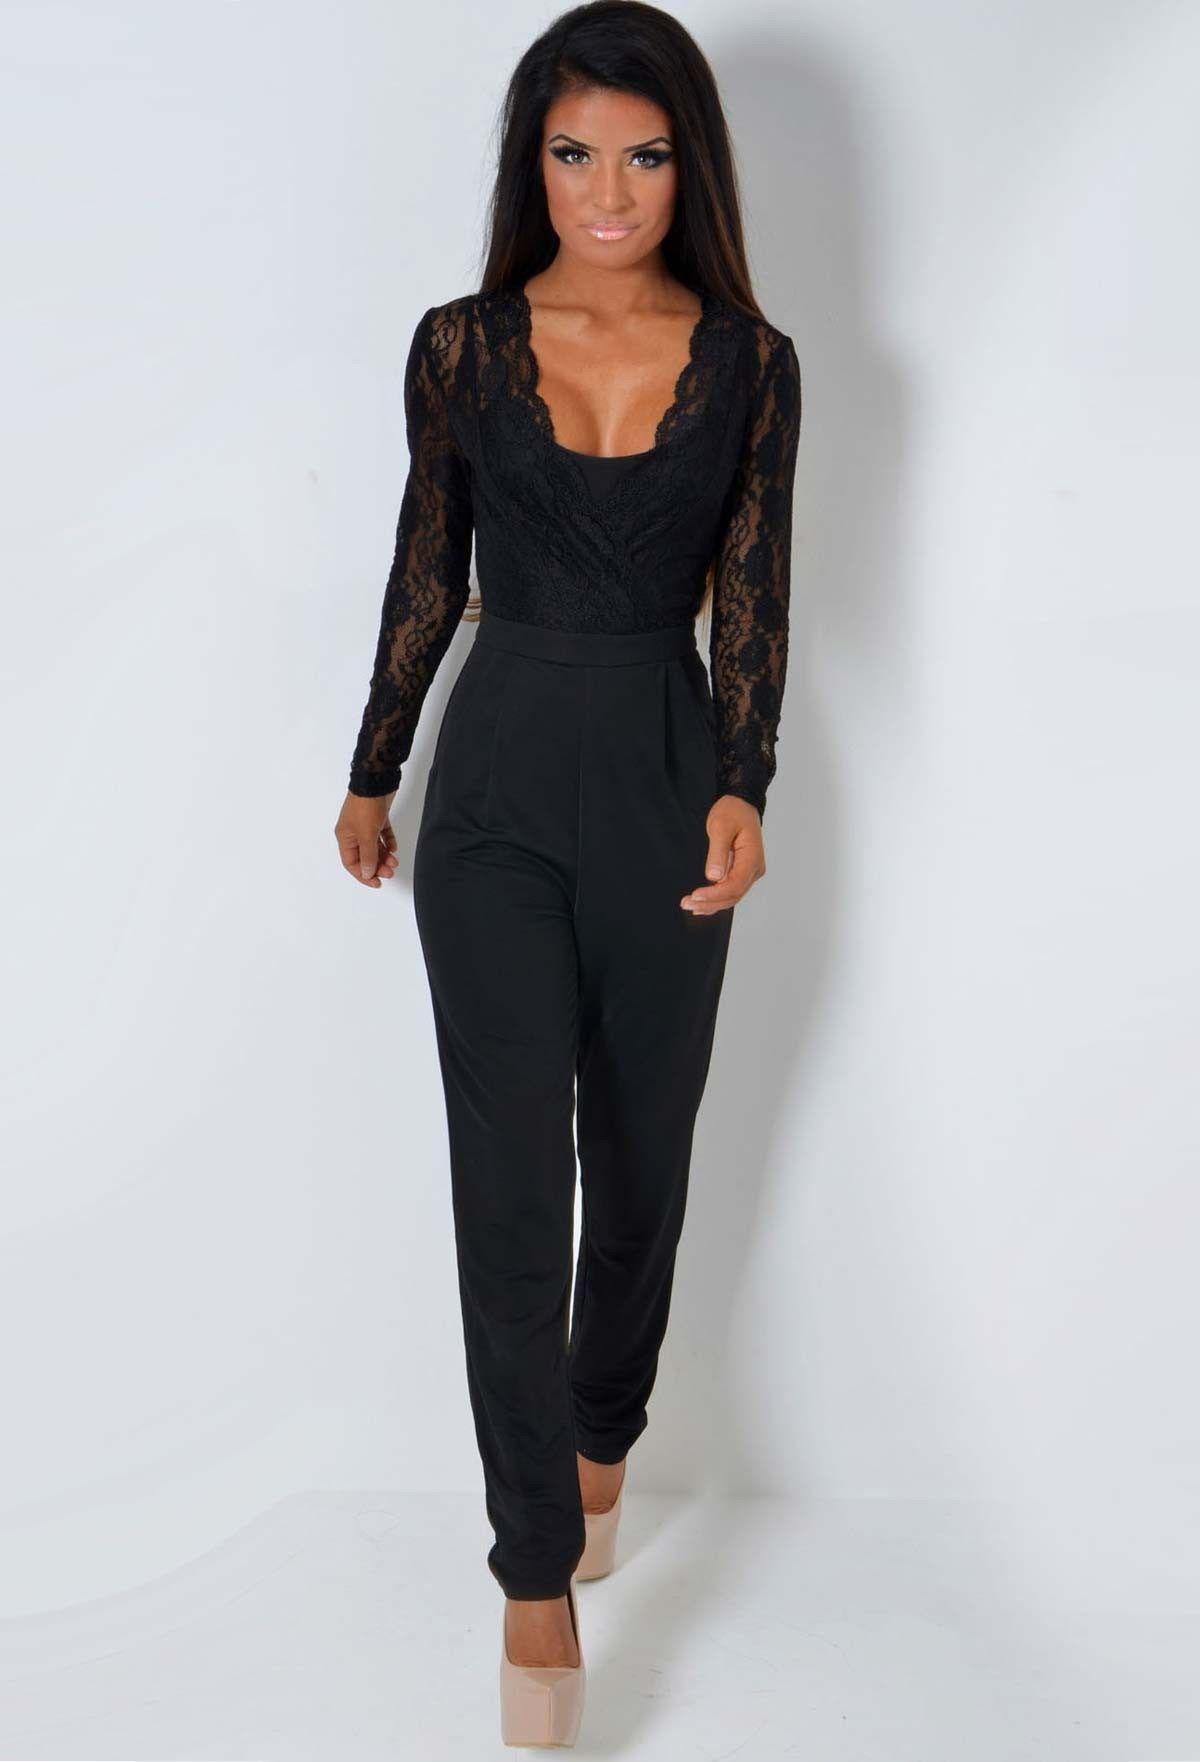 06a2fa0f2cc Cute Long Sleeve Jumpsuit   Divine Long Sleeve Jumpsuit